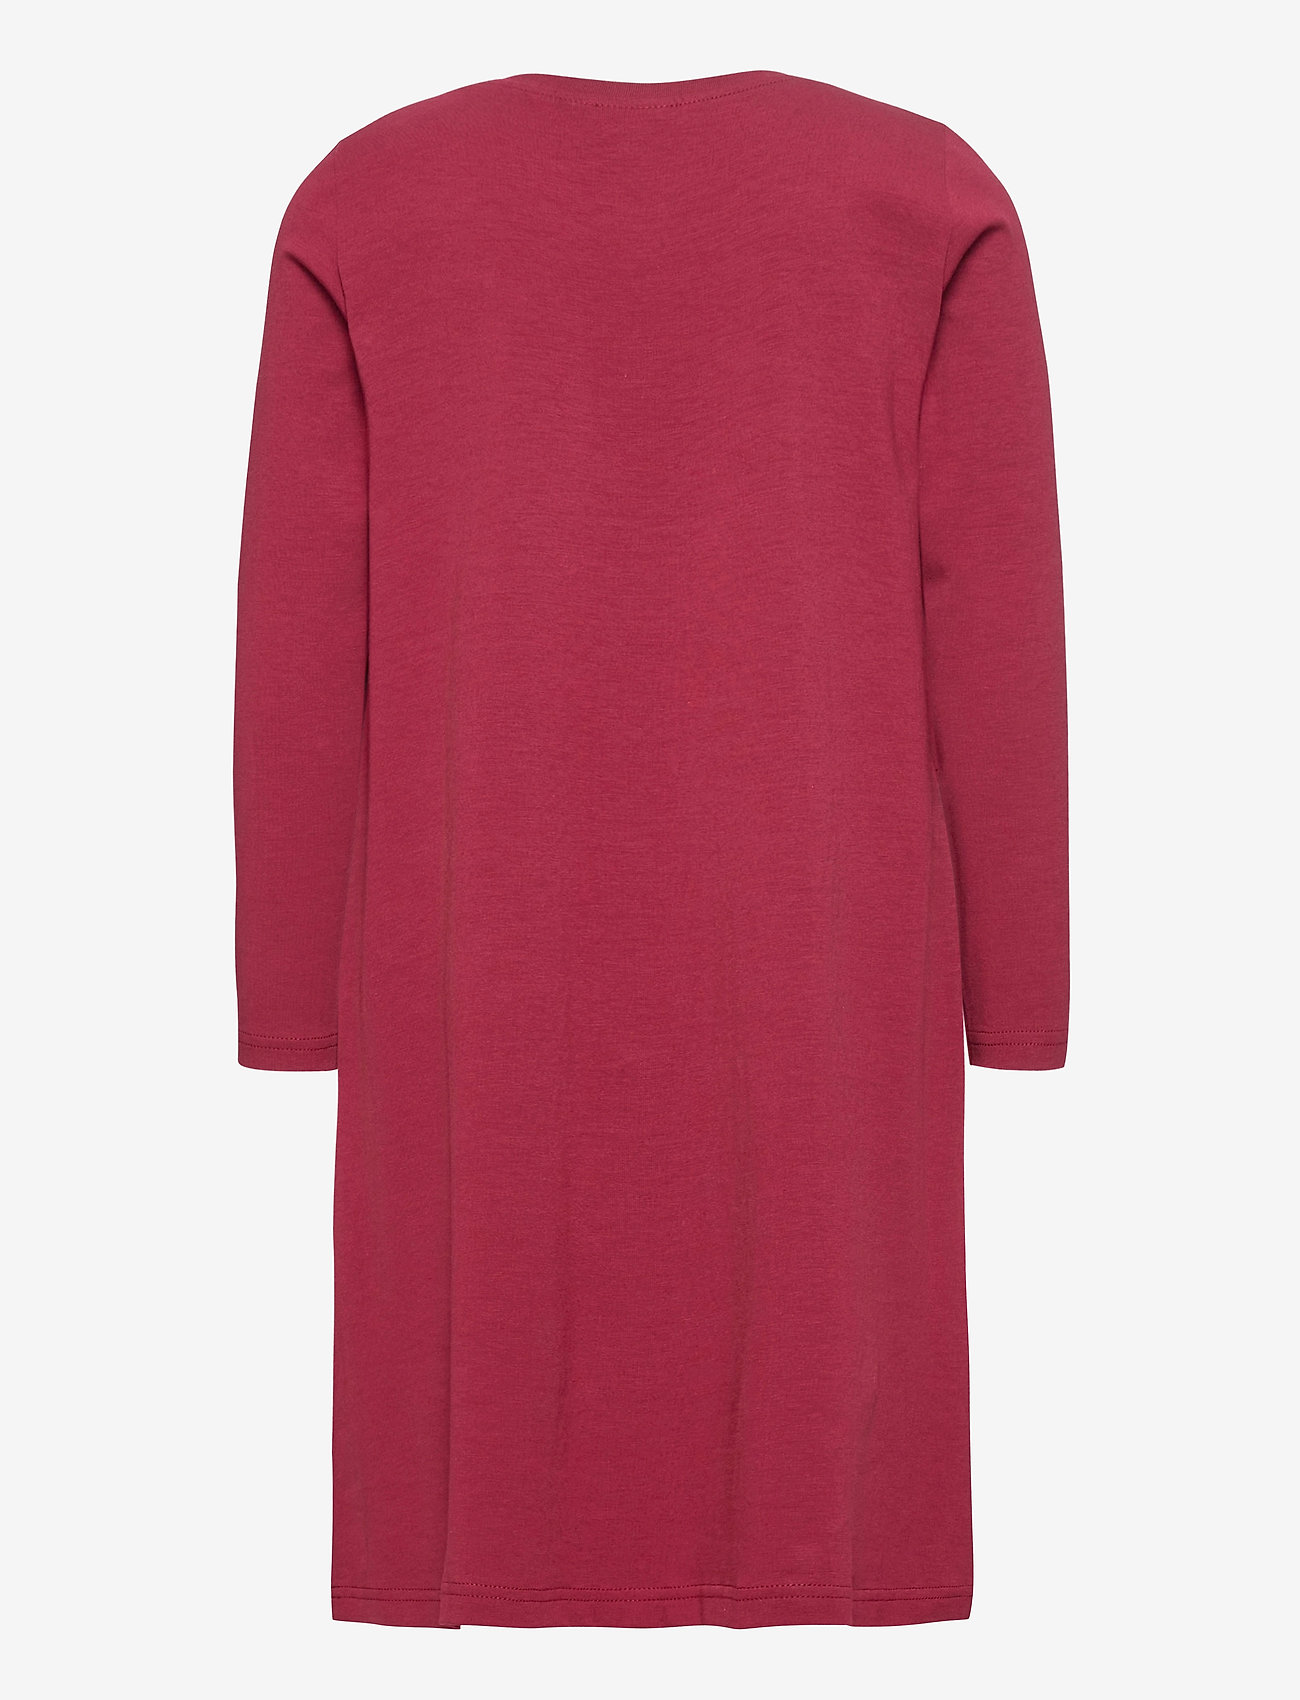 Papu - WAVE DRESS - kleider - deep red - 1